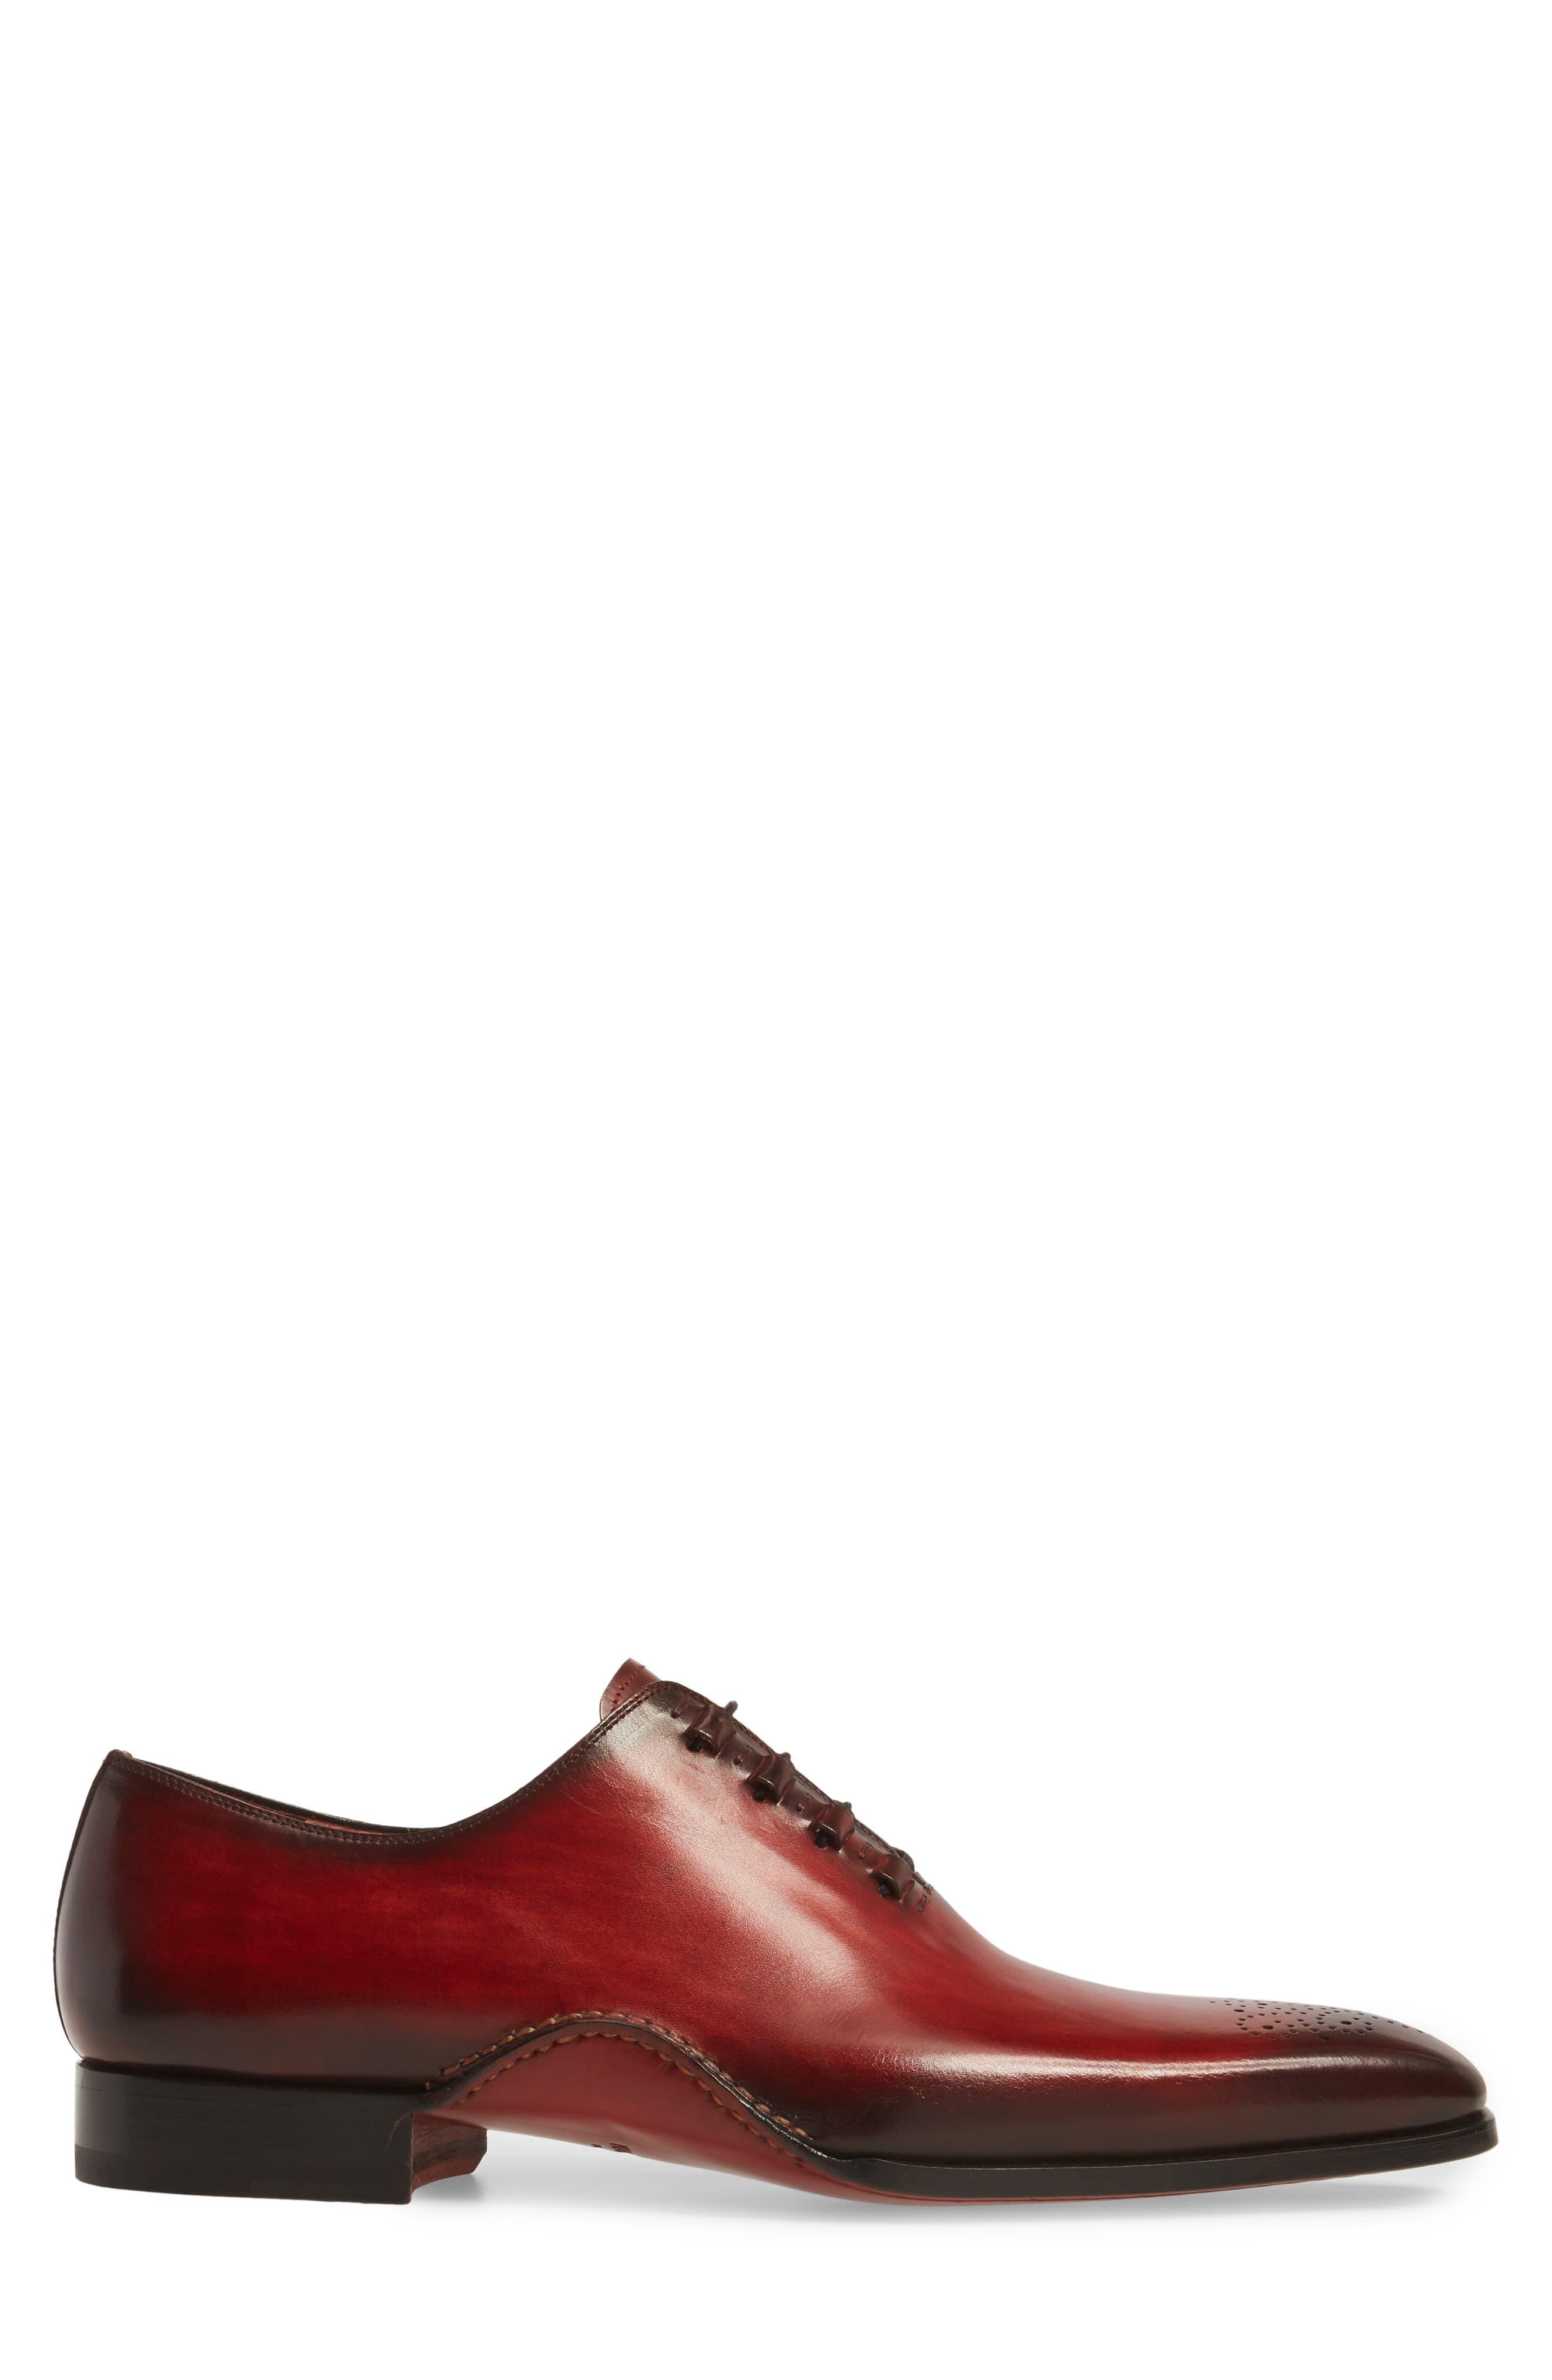 Josue Wholecut Oxford,                             Alternate thumbnail 3, color,                             Red Leather